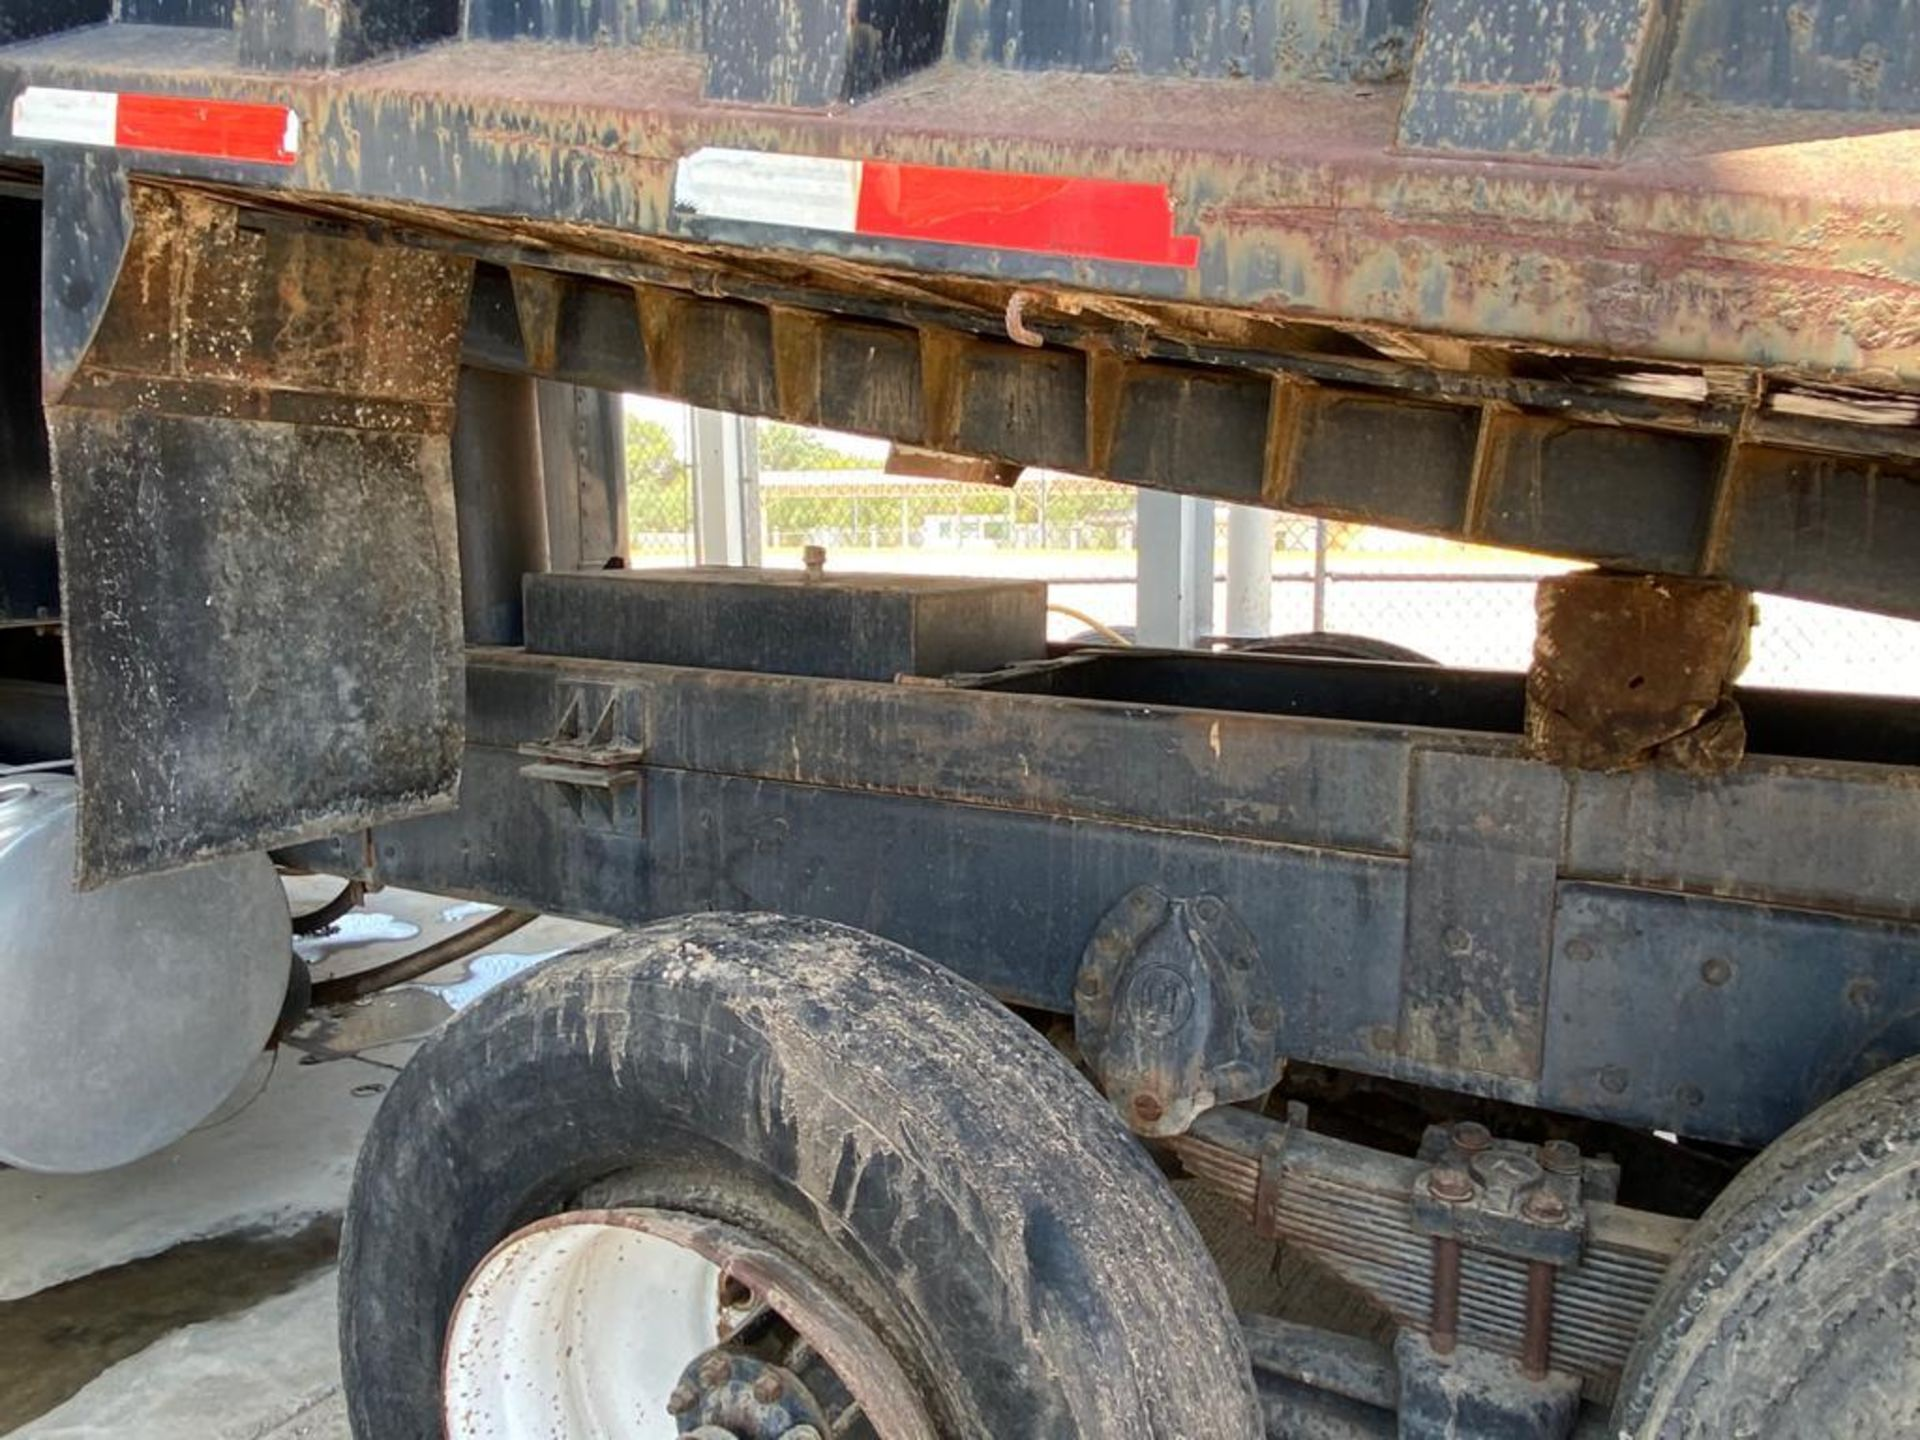 1983 Kenworth Dump Truck, standard transmission of 10 speeds, with Cummins motor - Image 53 of 68